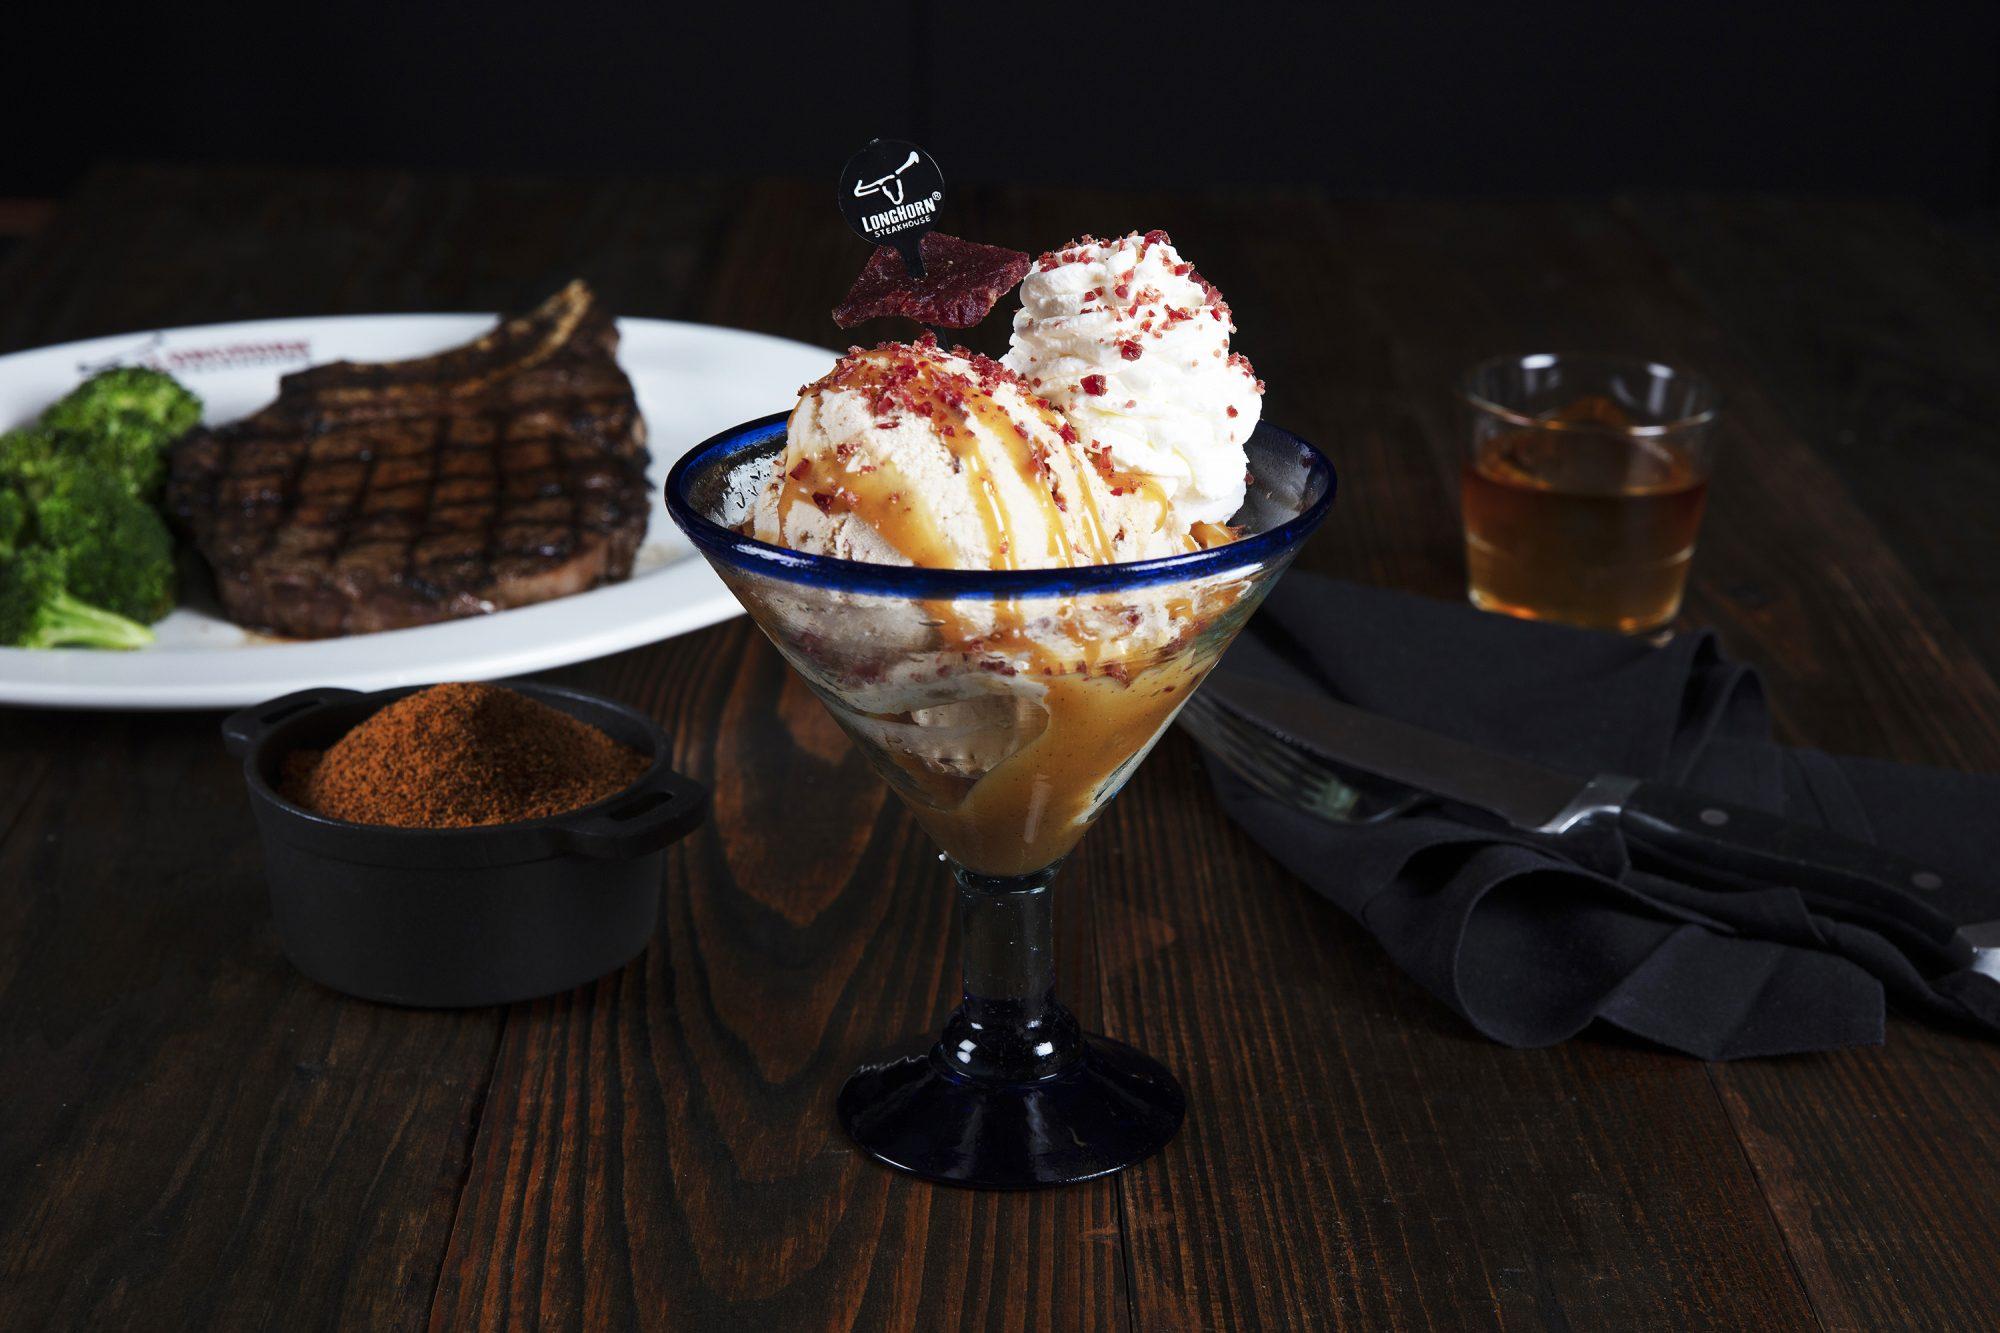 Longhorn steak and bourbon ice cream